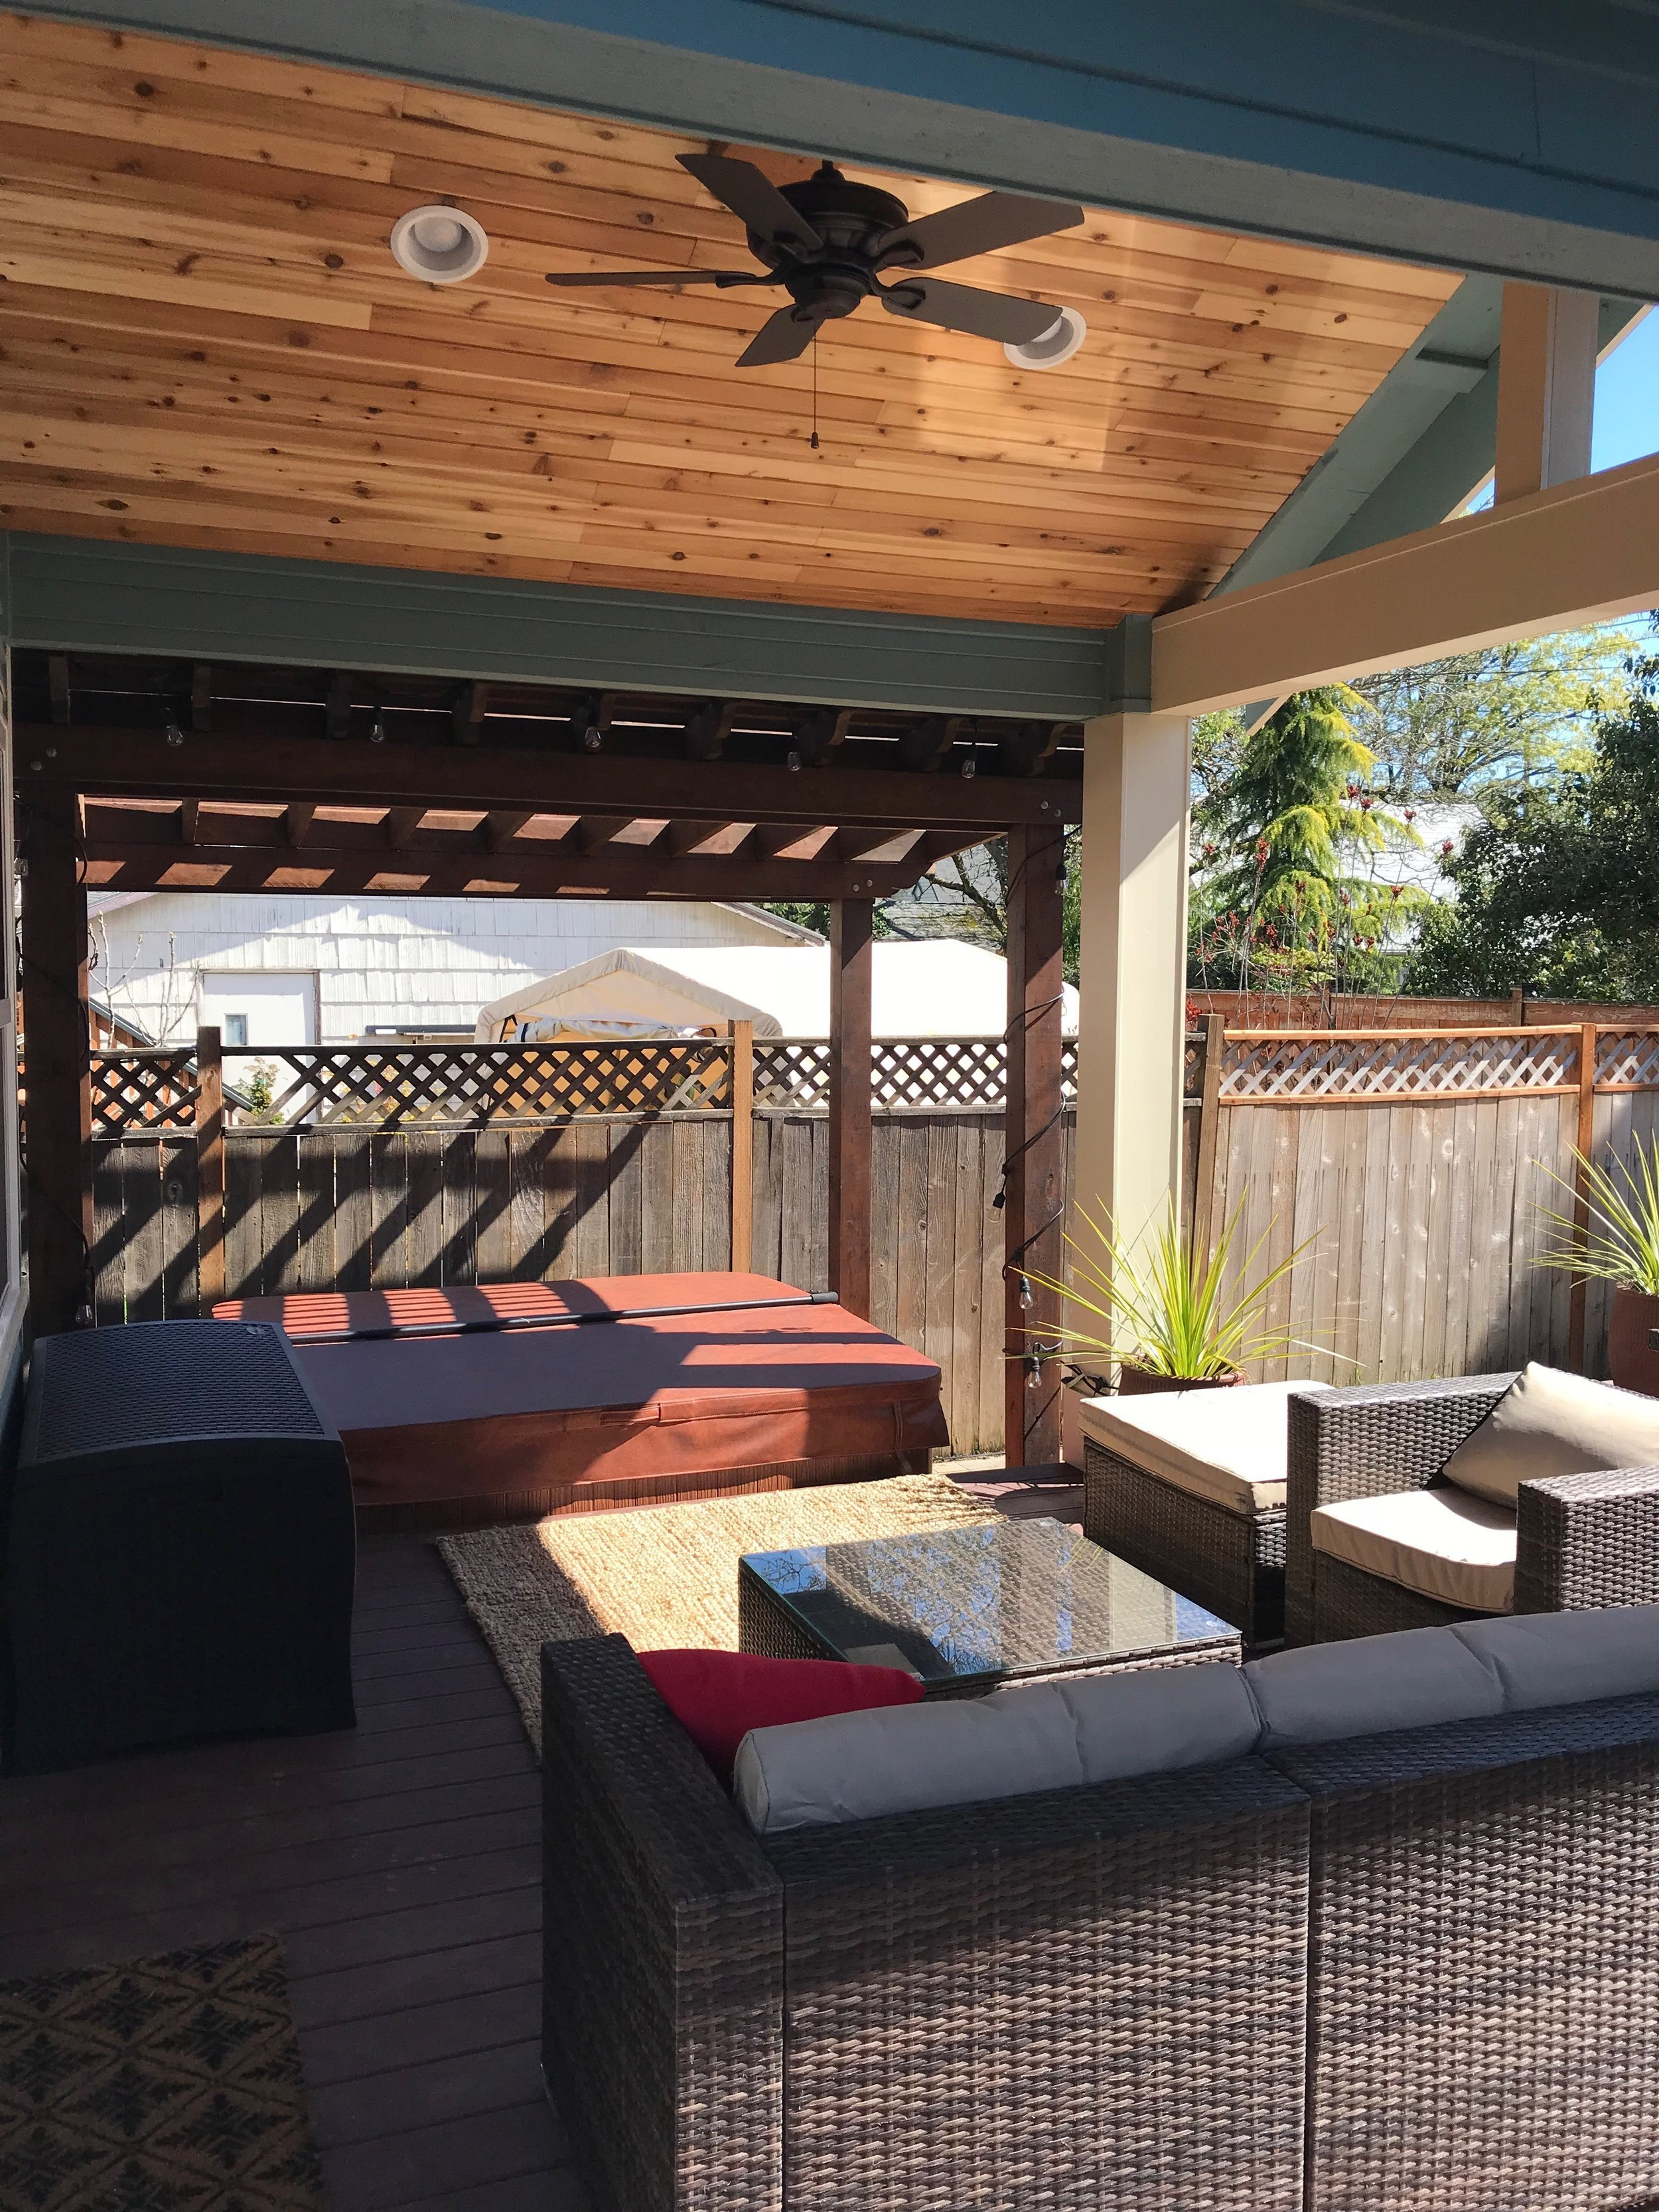 Batista Residence Deck1.jpeg